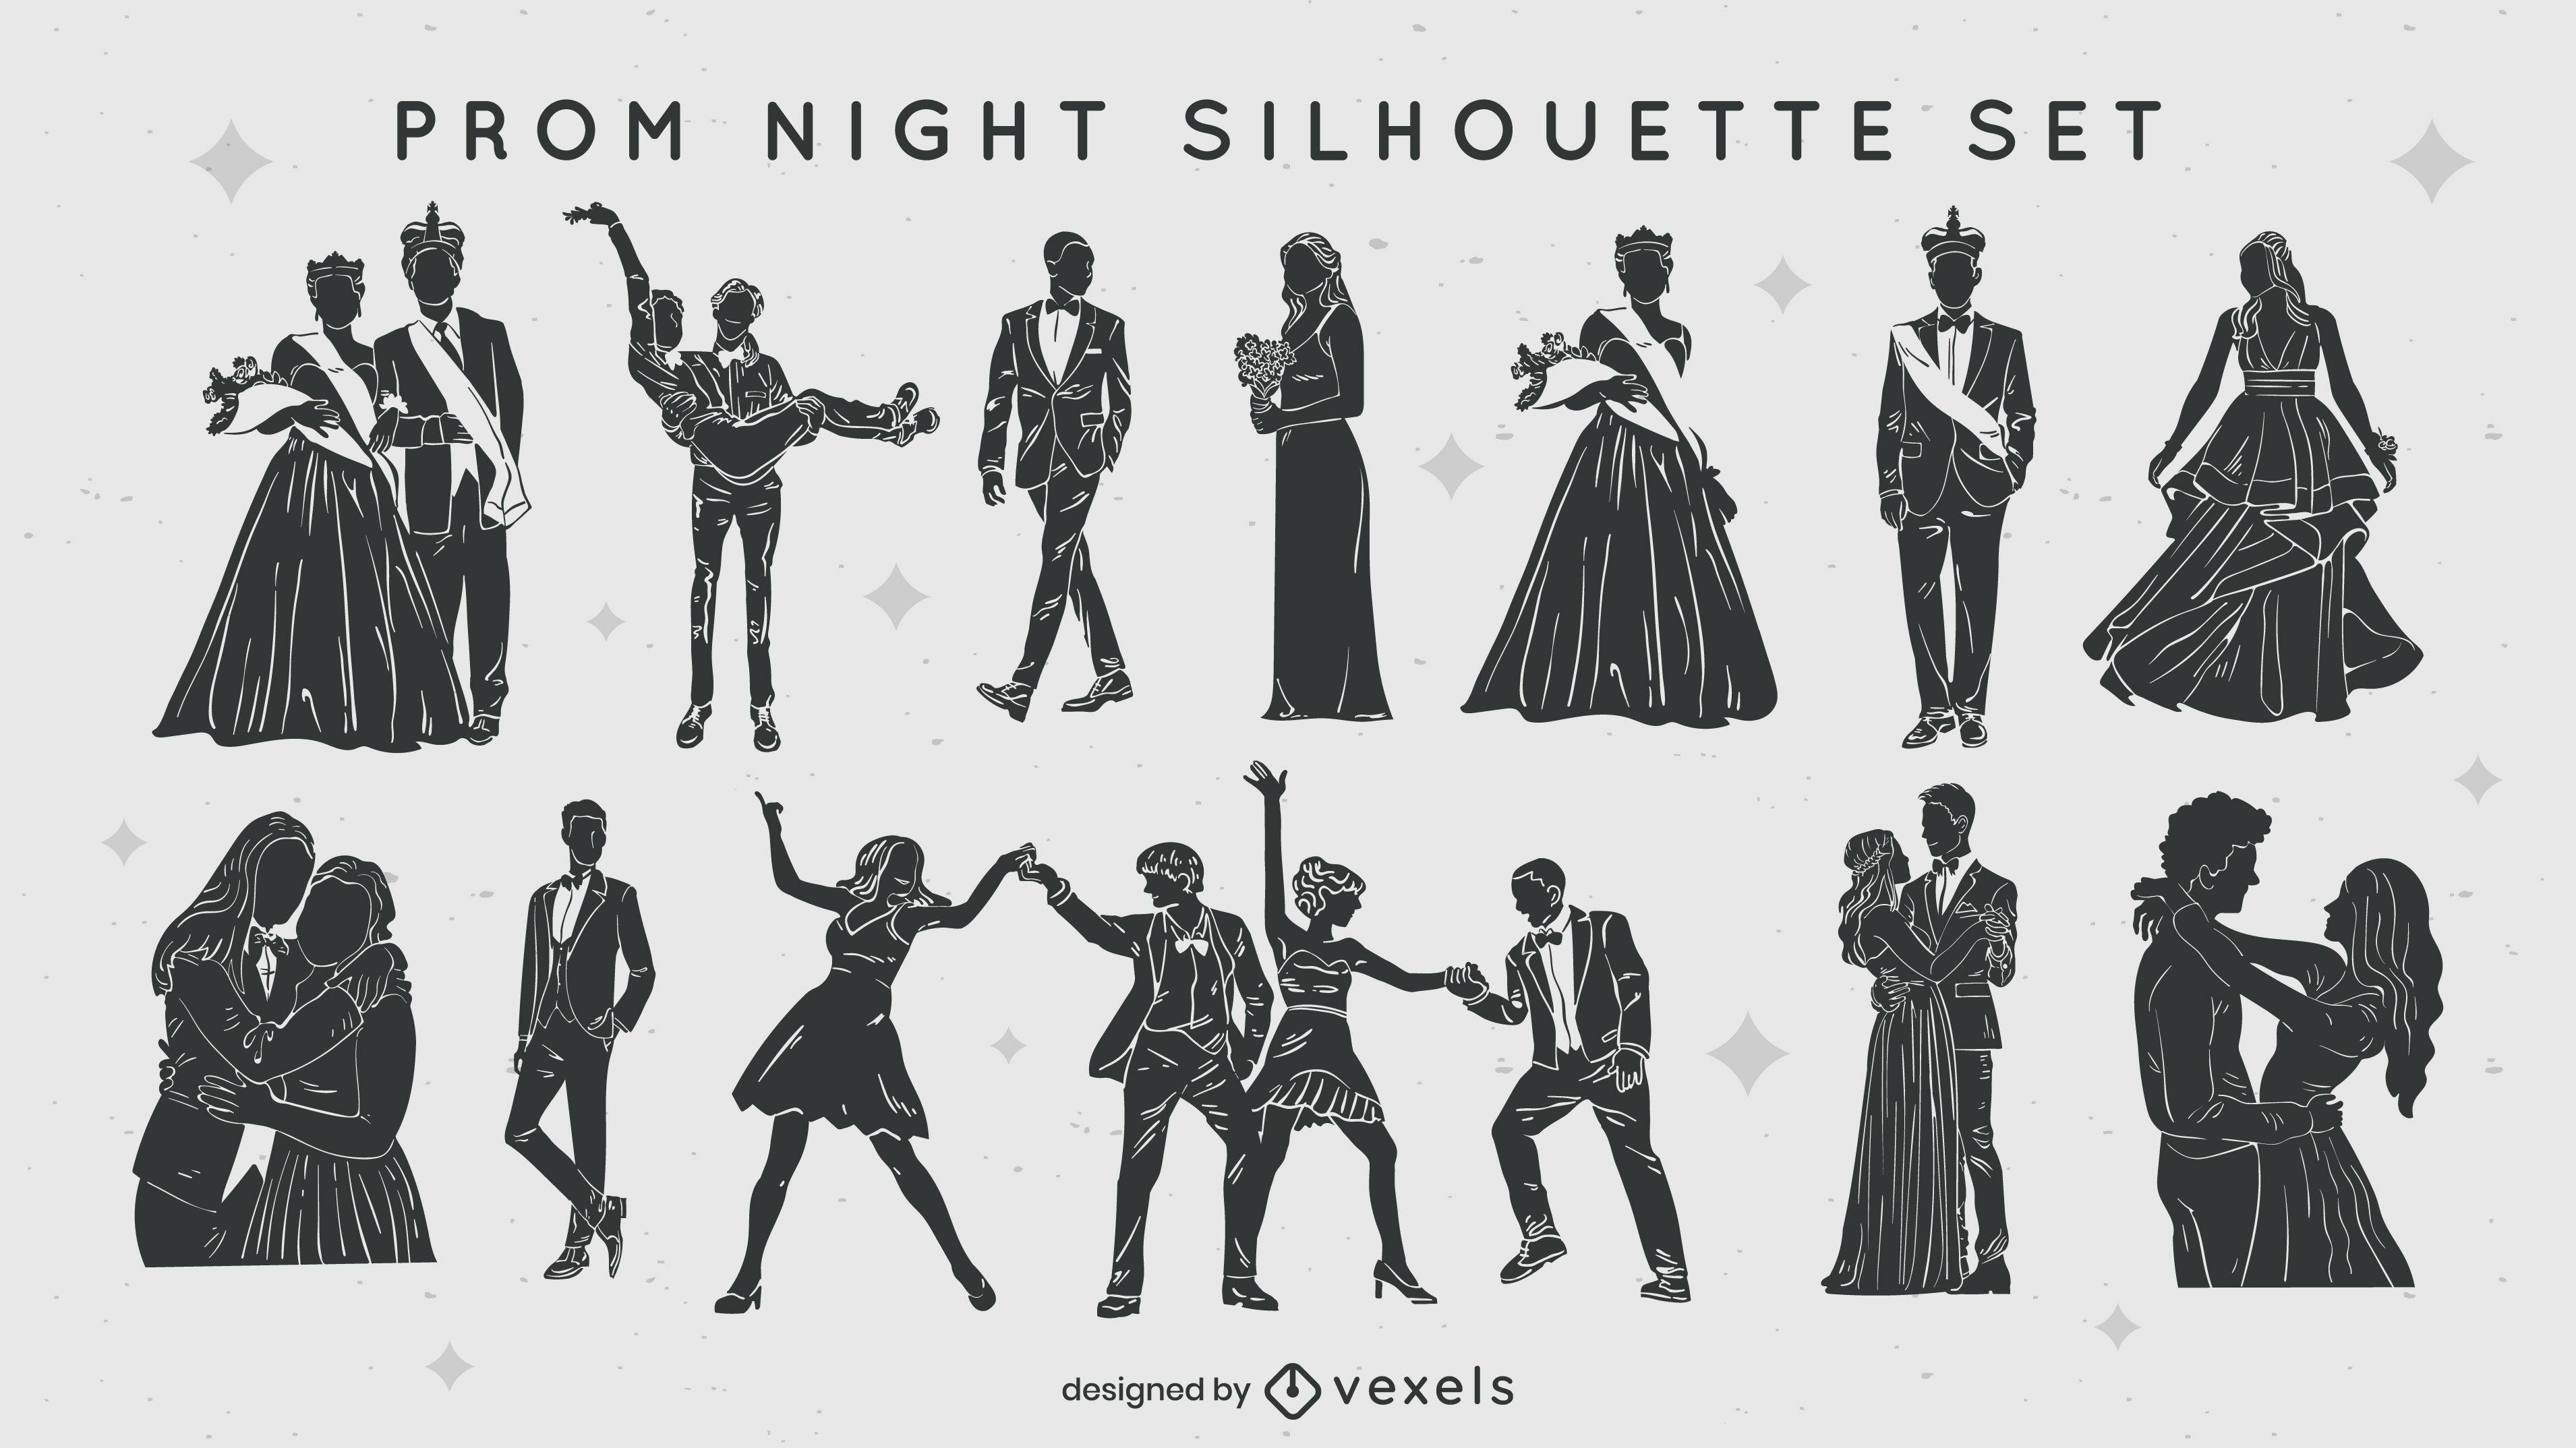 Abschlussballnacht Silhouetten Set ausgeschnitten